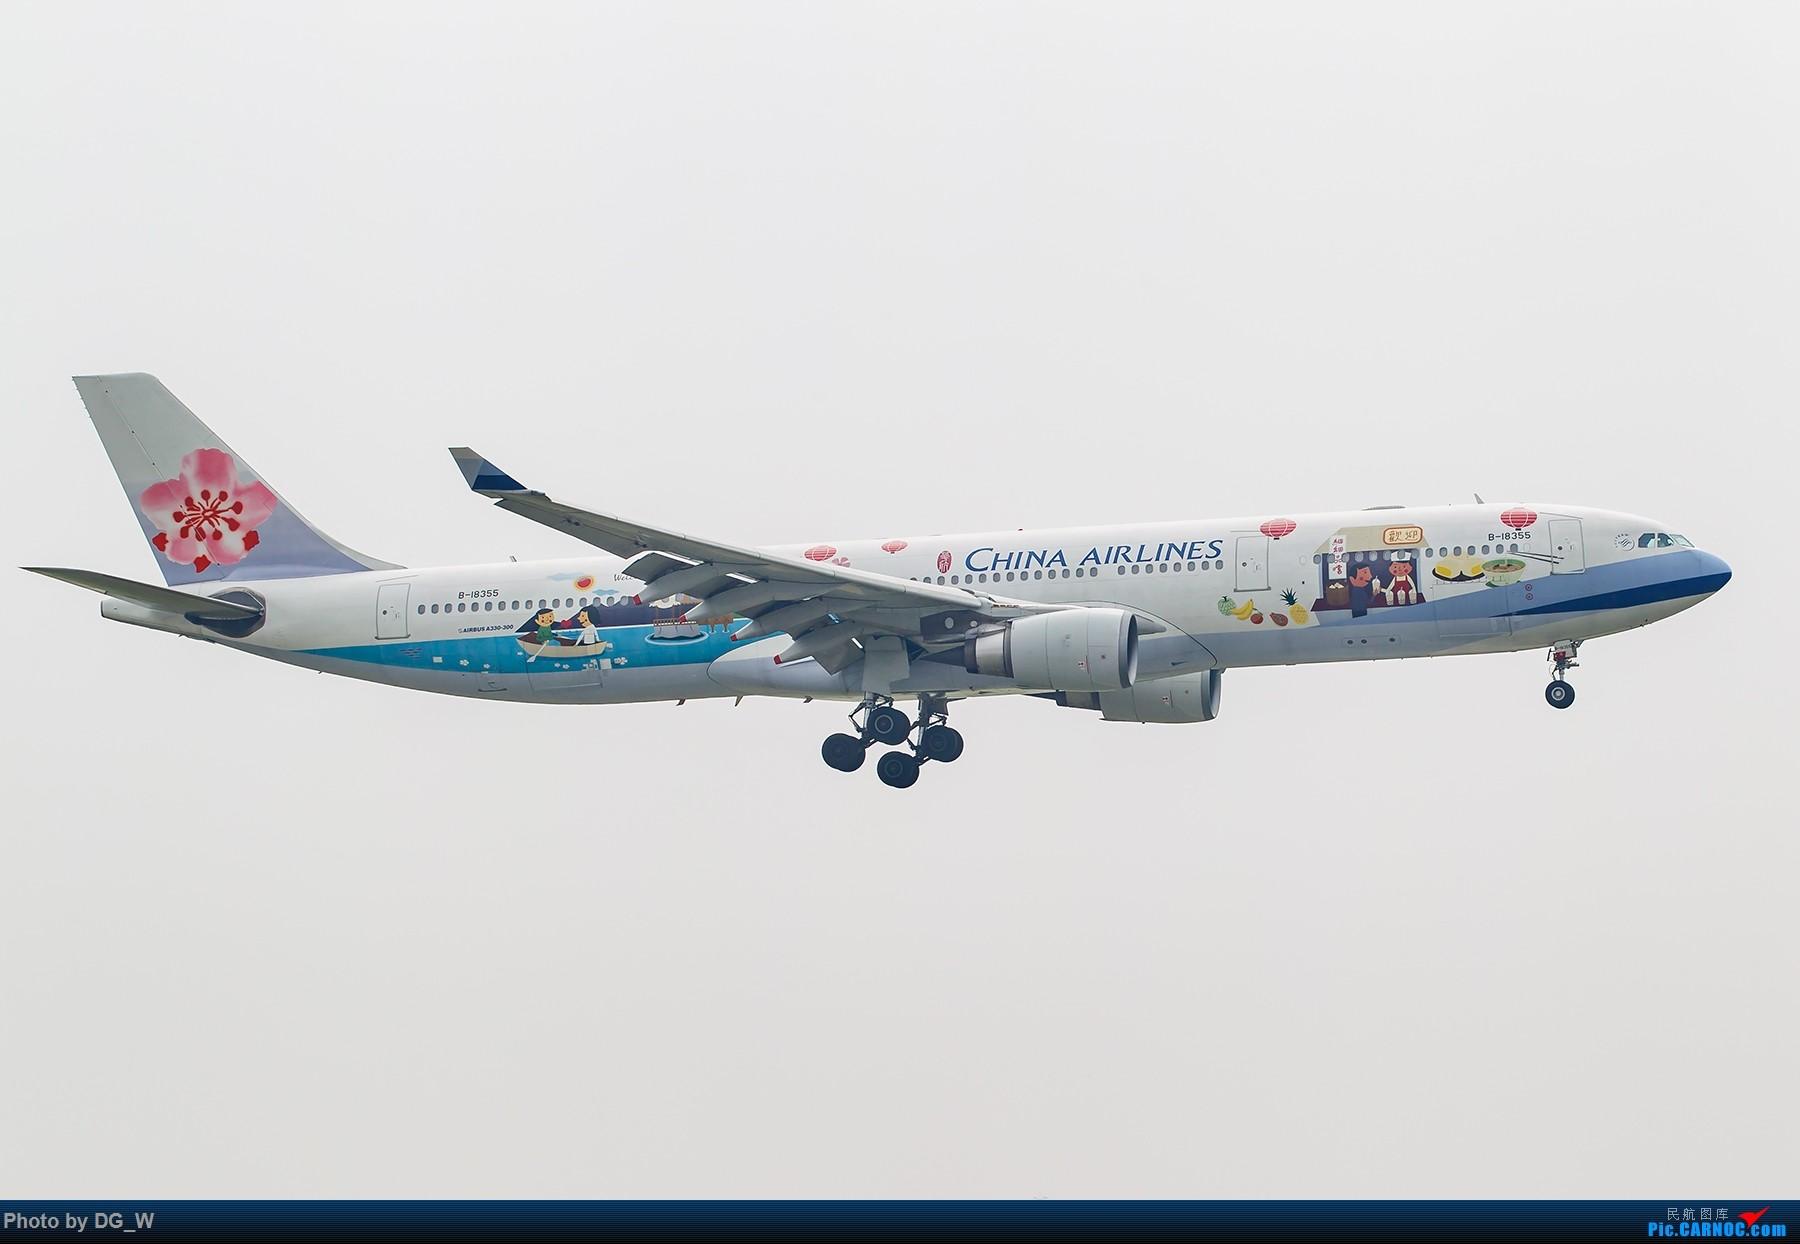 Re:[原创]【南宁飞友】两月之内三次虹桥拍机,大雨中的吹水,水泥天的迪斯尼,晚点的789,不期而遇的ARJ AIRBUS A330-300 B-18355 中国上海虹桥国际机场